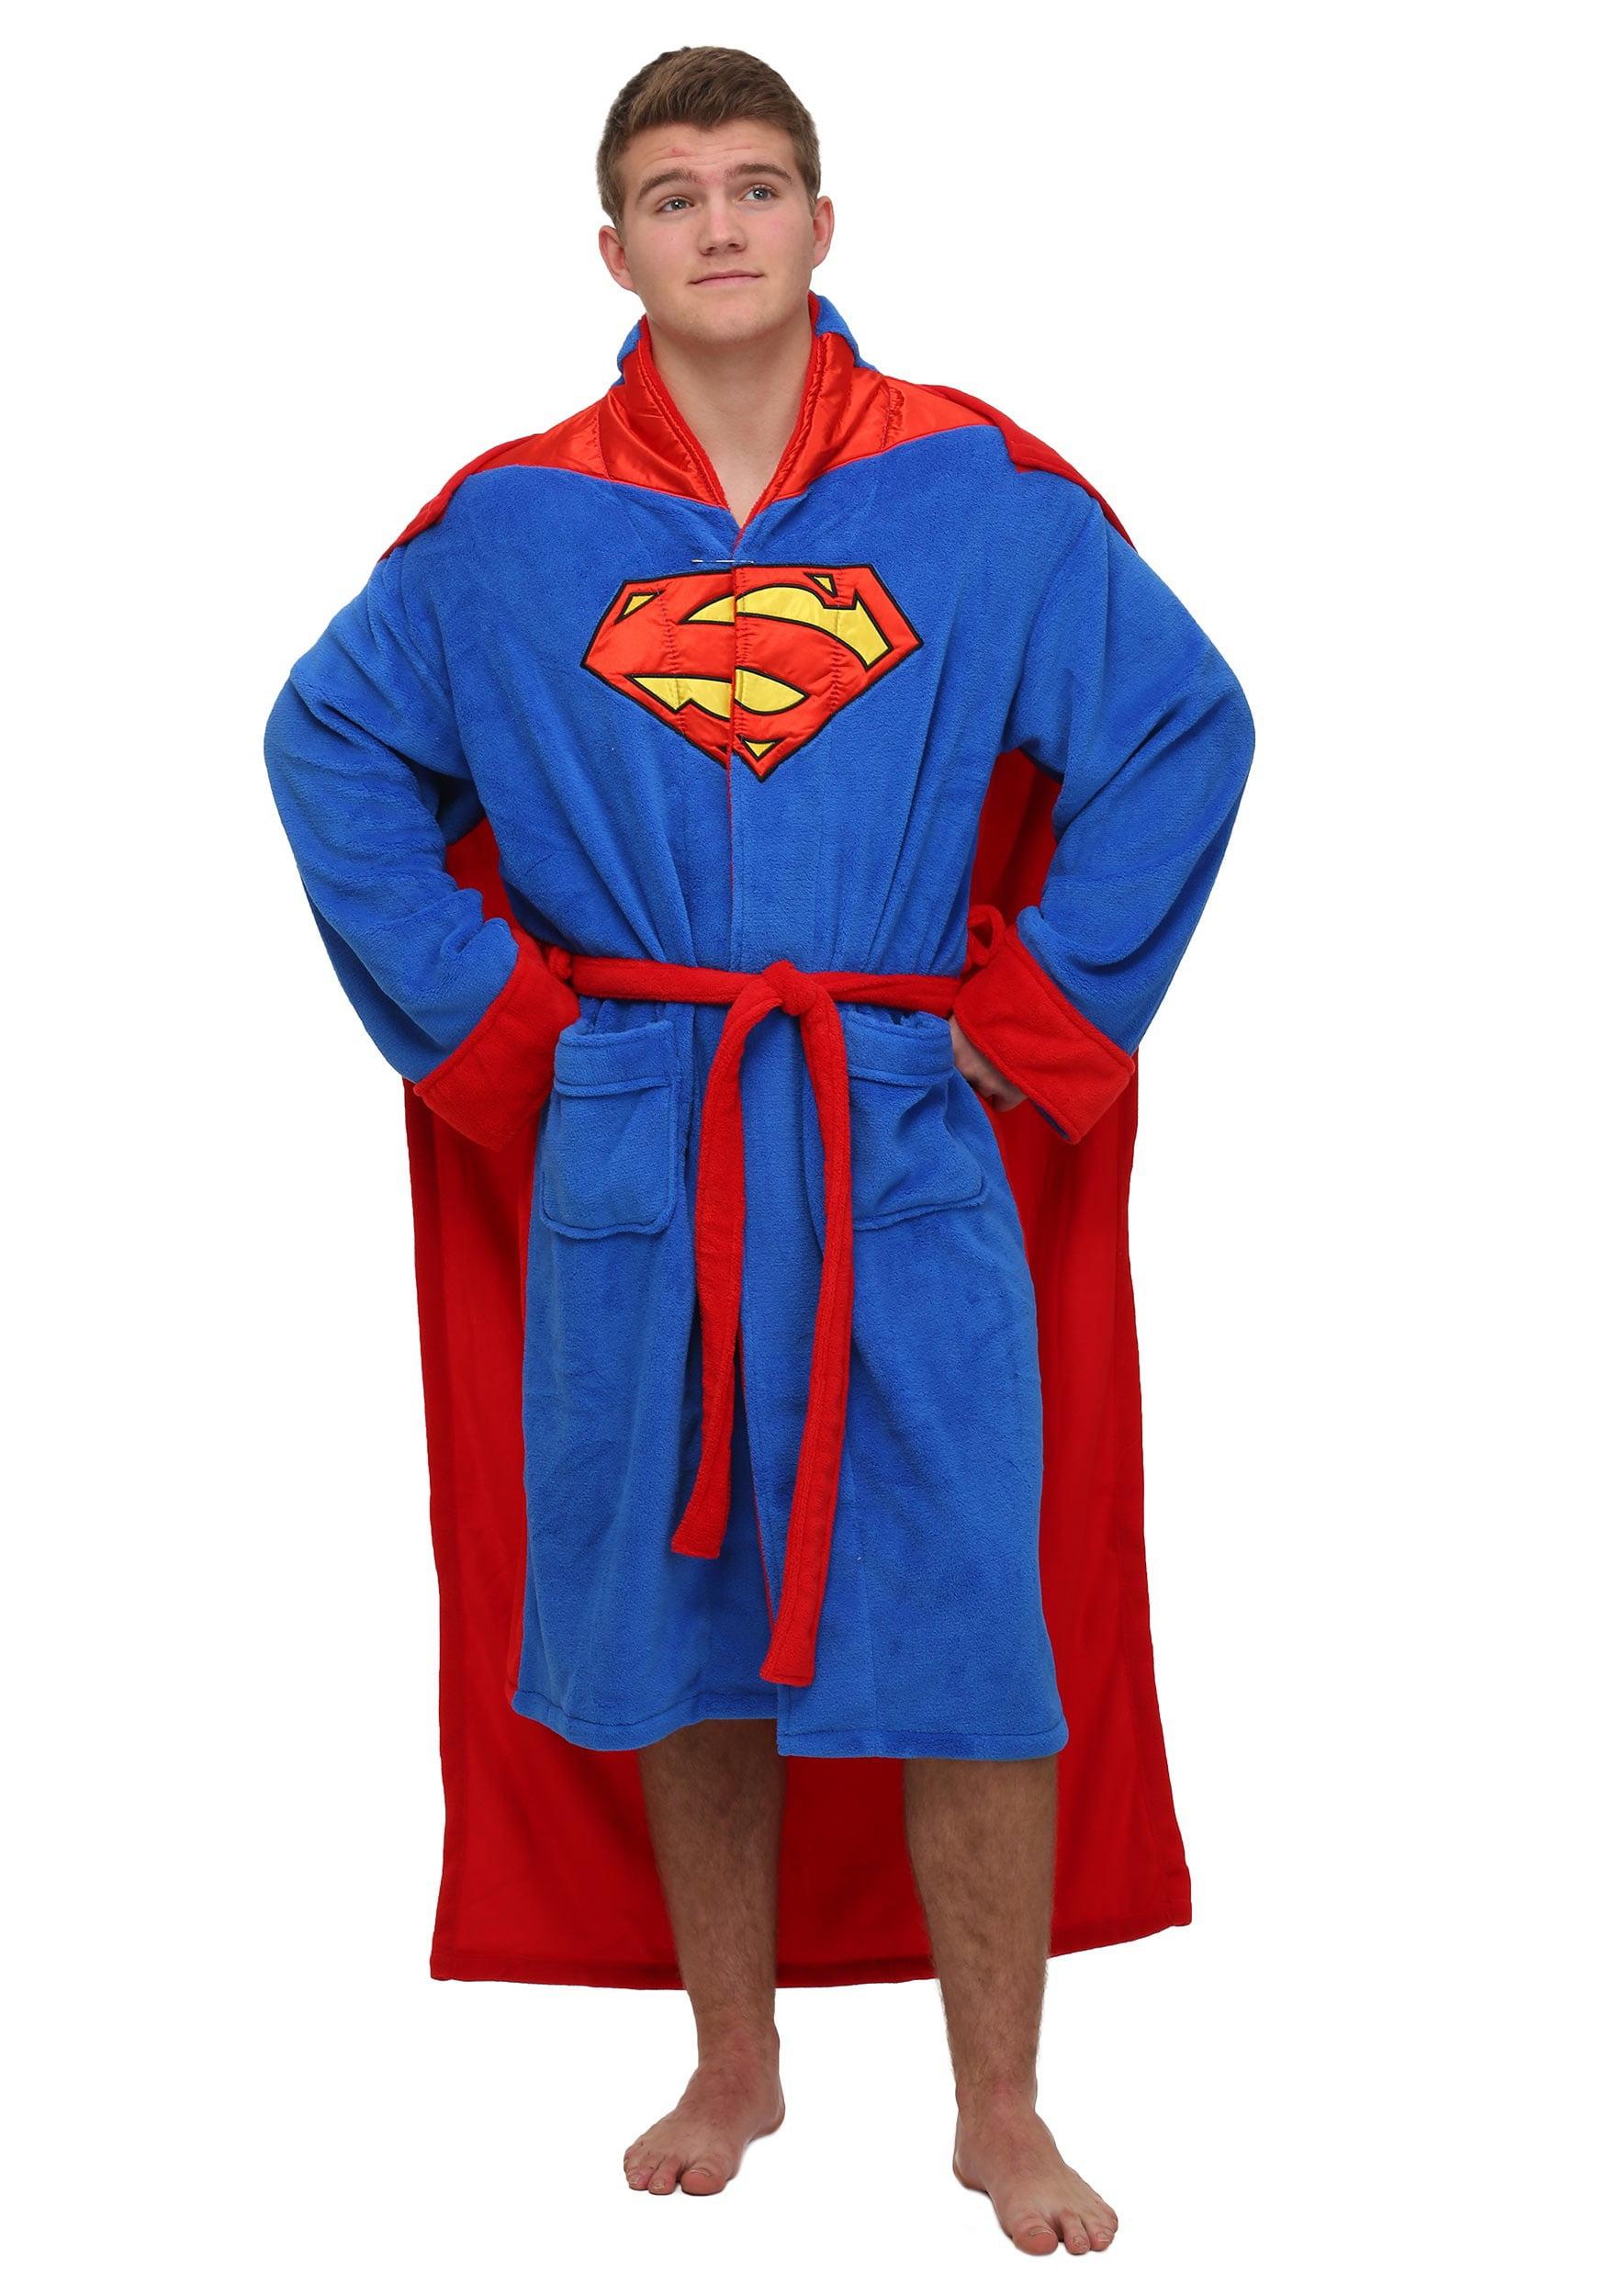 Dc Comics Superman Mens Fleece Bathrobe Swim Suit Cover Up With Cape Walmart Com Walmart Com